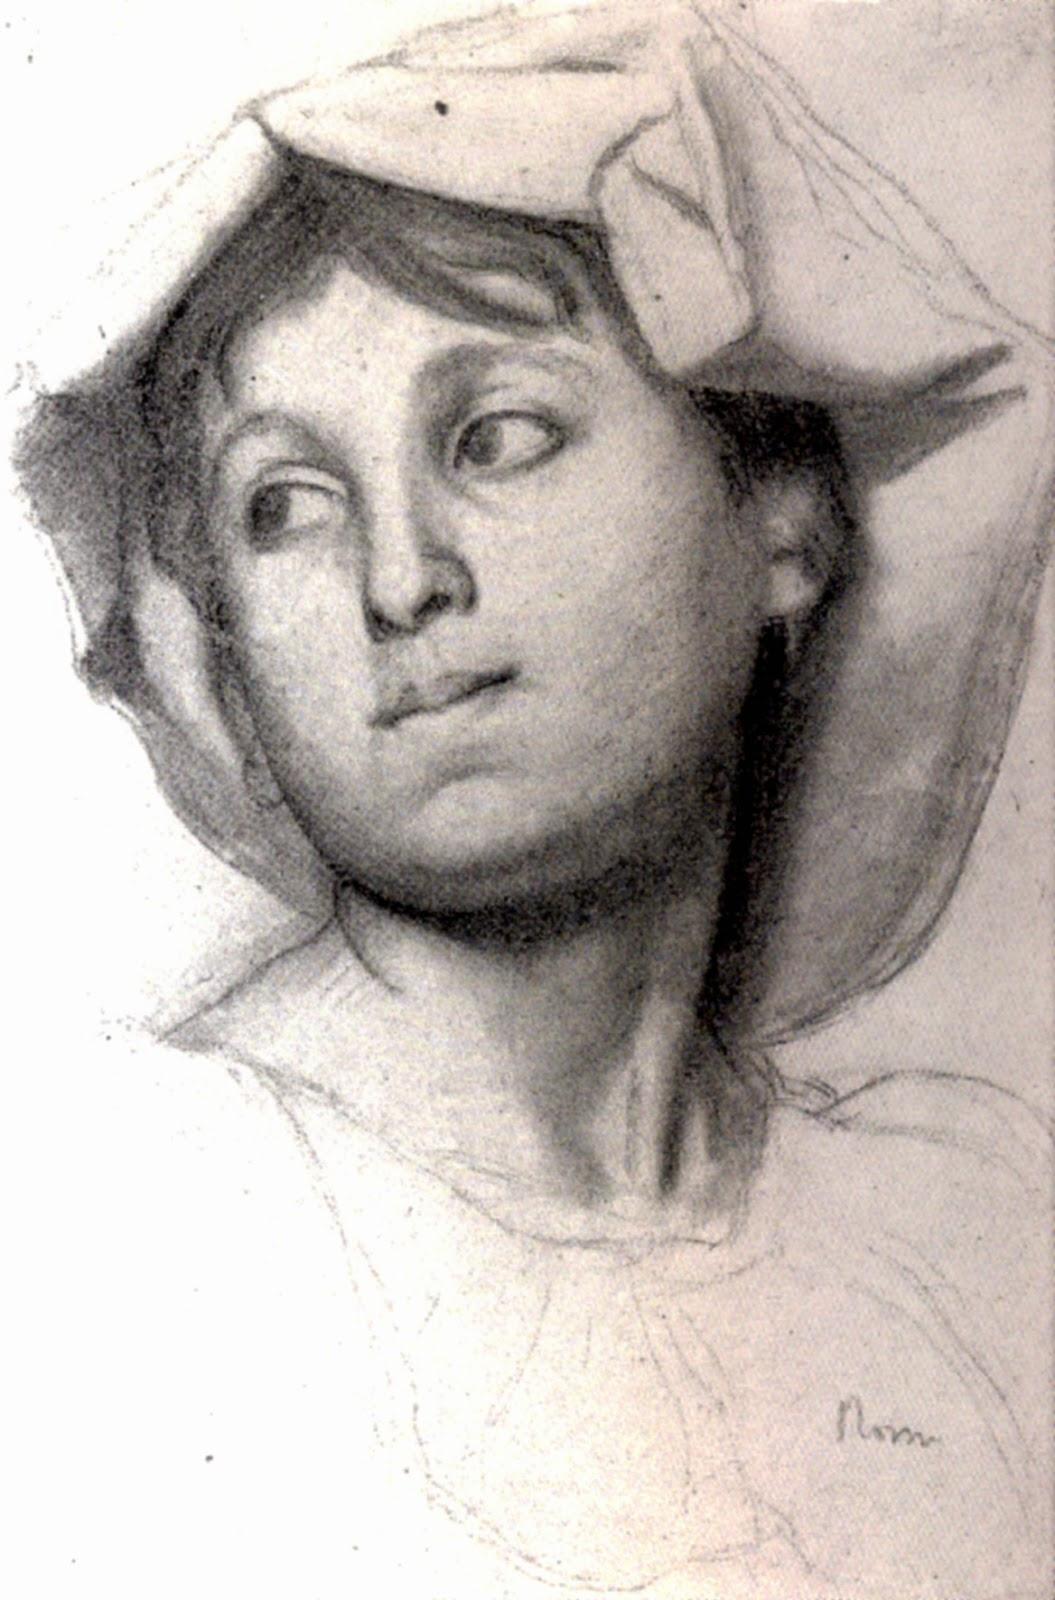 Drawn portrait degas DUKE: Edgar Degas: DRAWING DRAWING